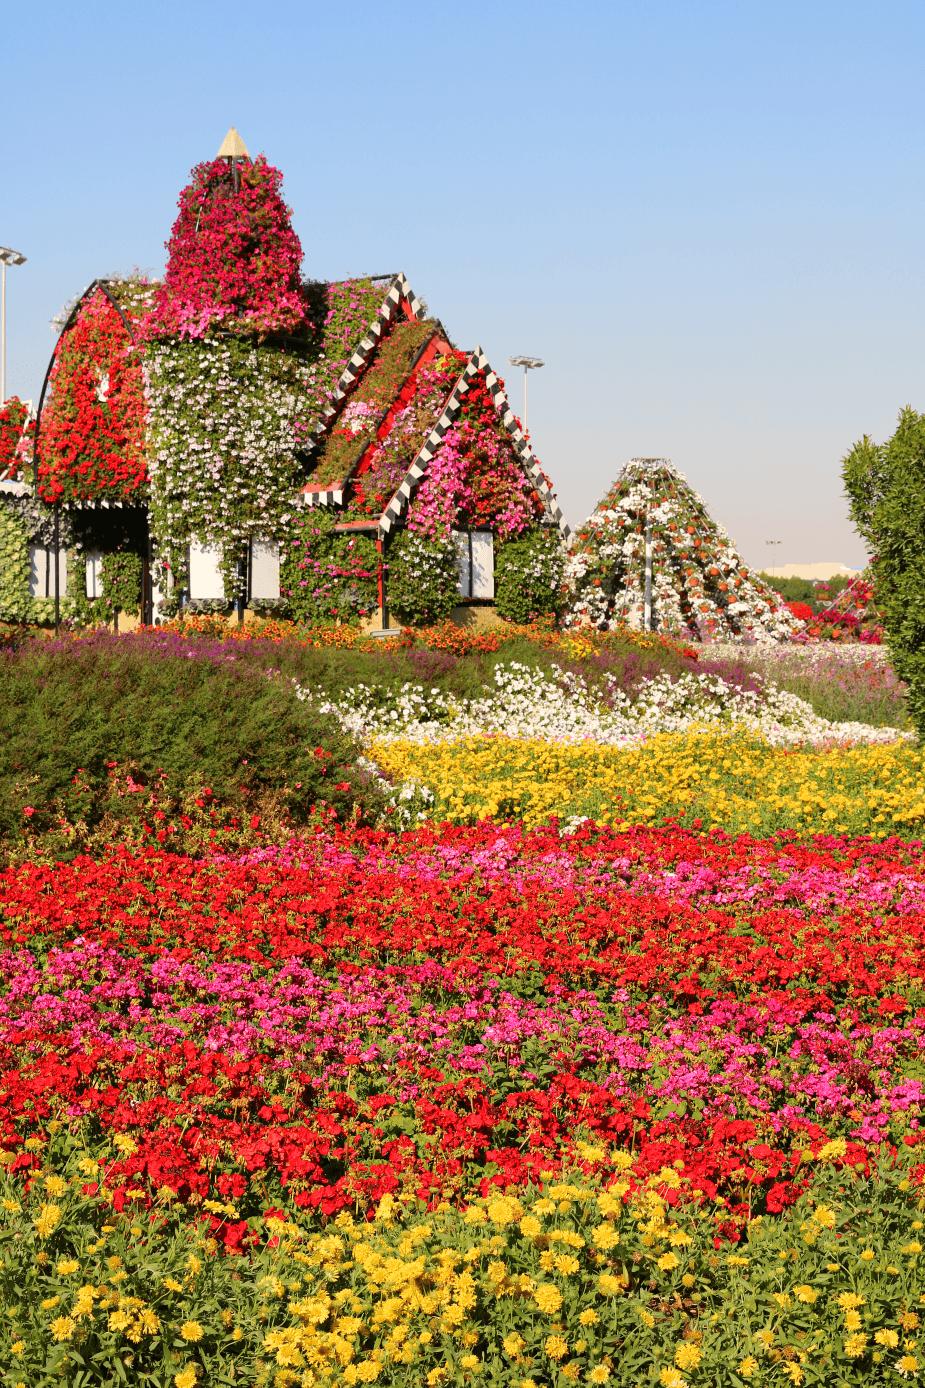 A desert oasis of 45 million flowers at Dubai Miracle